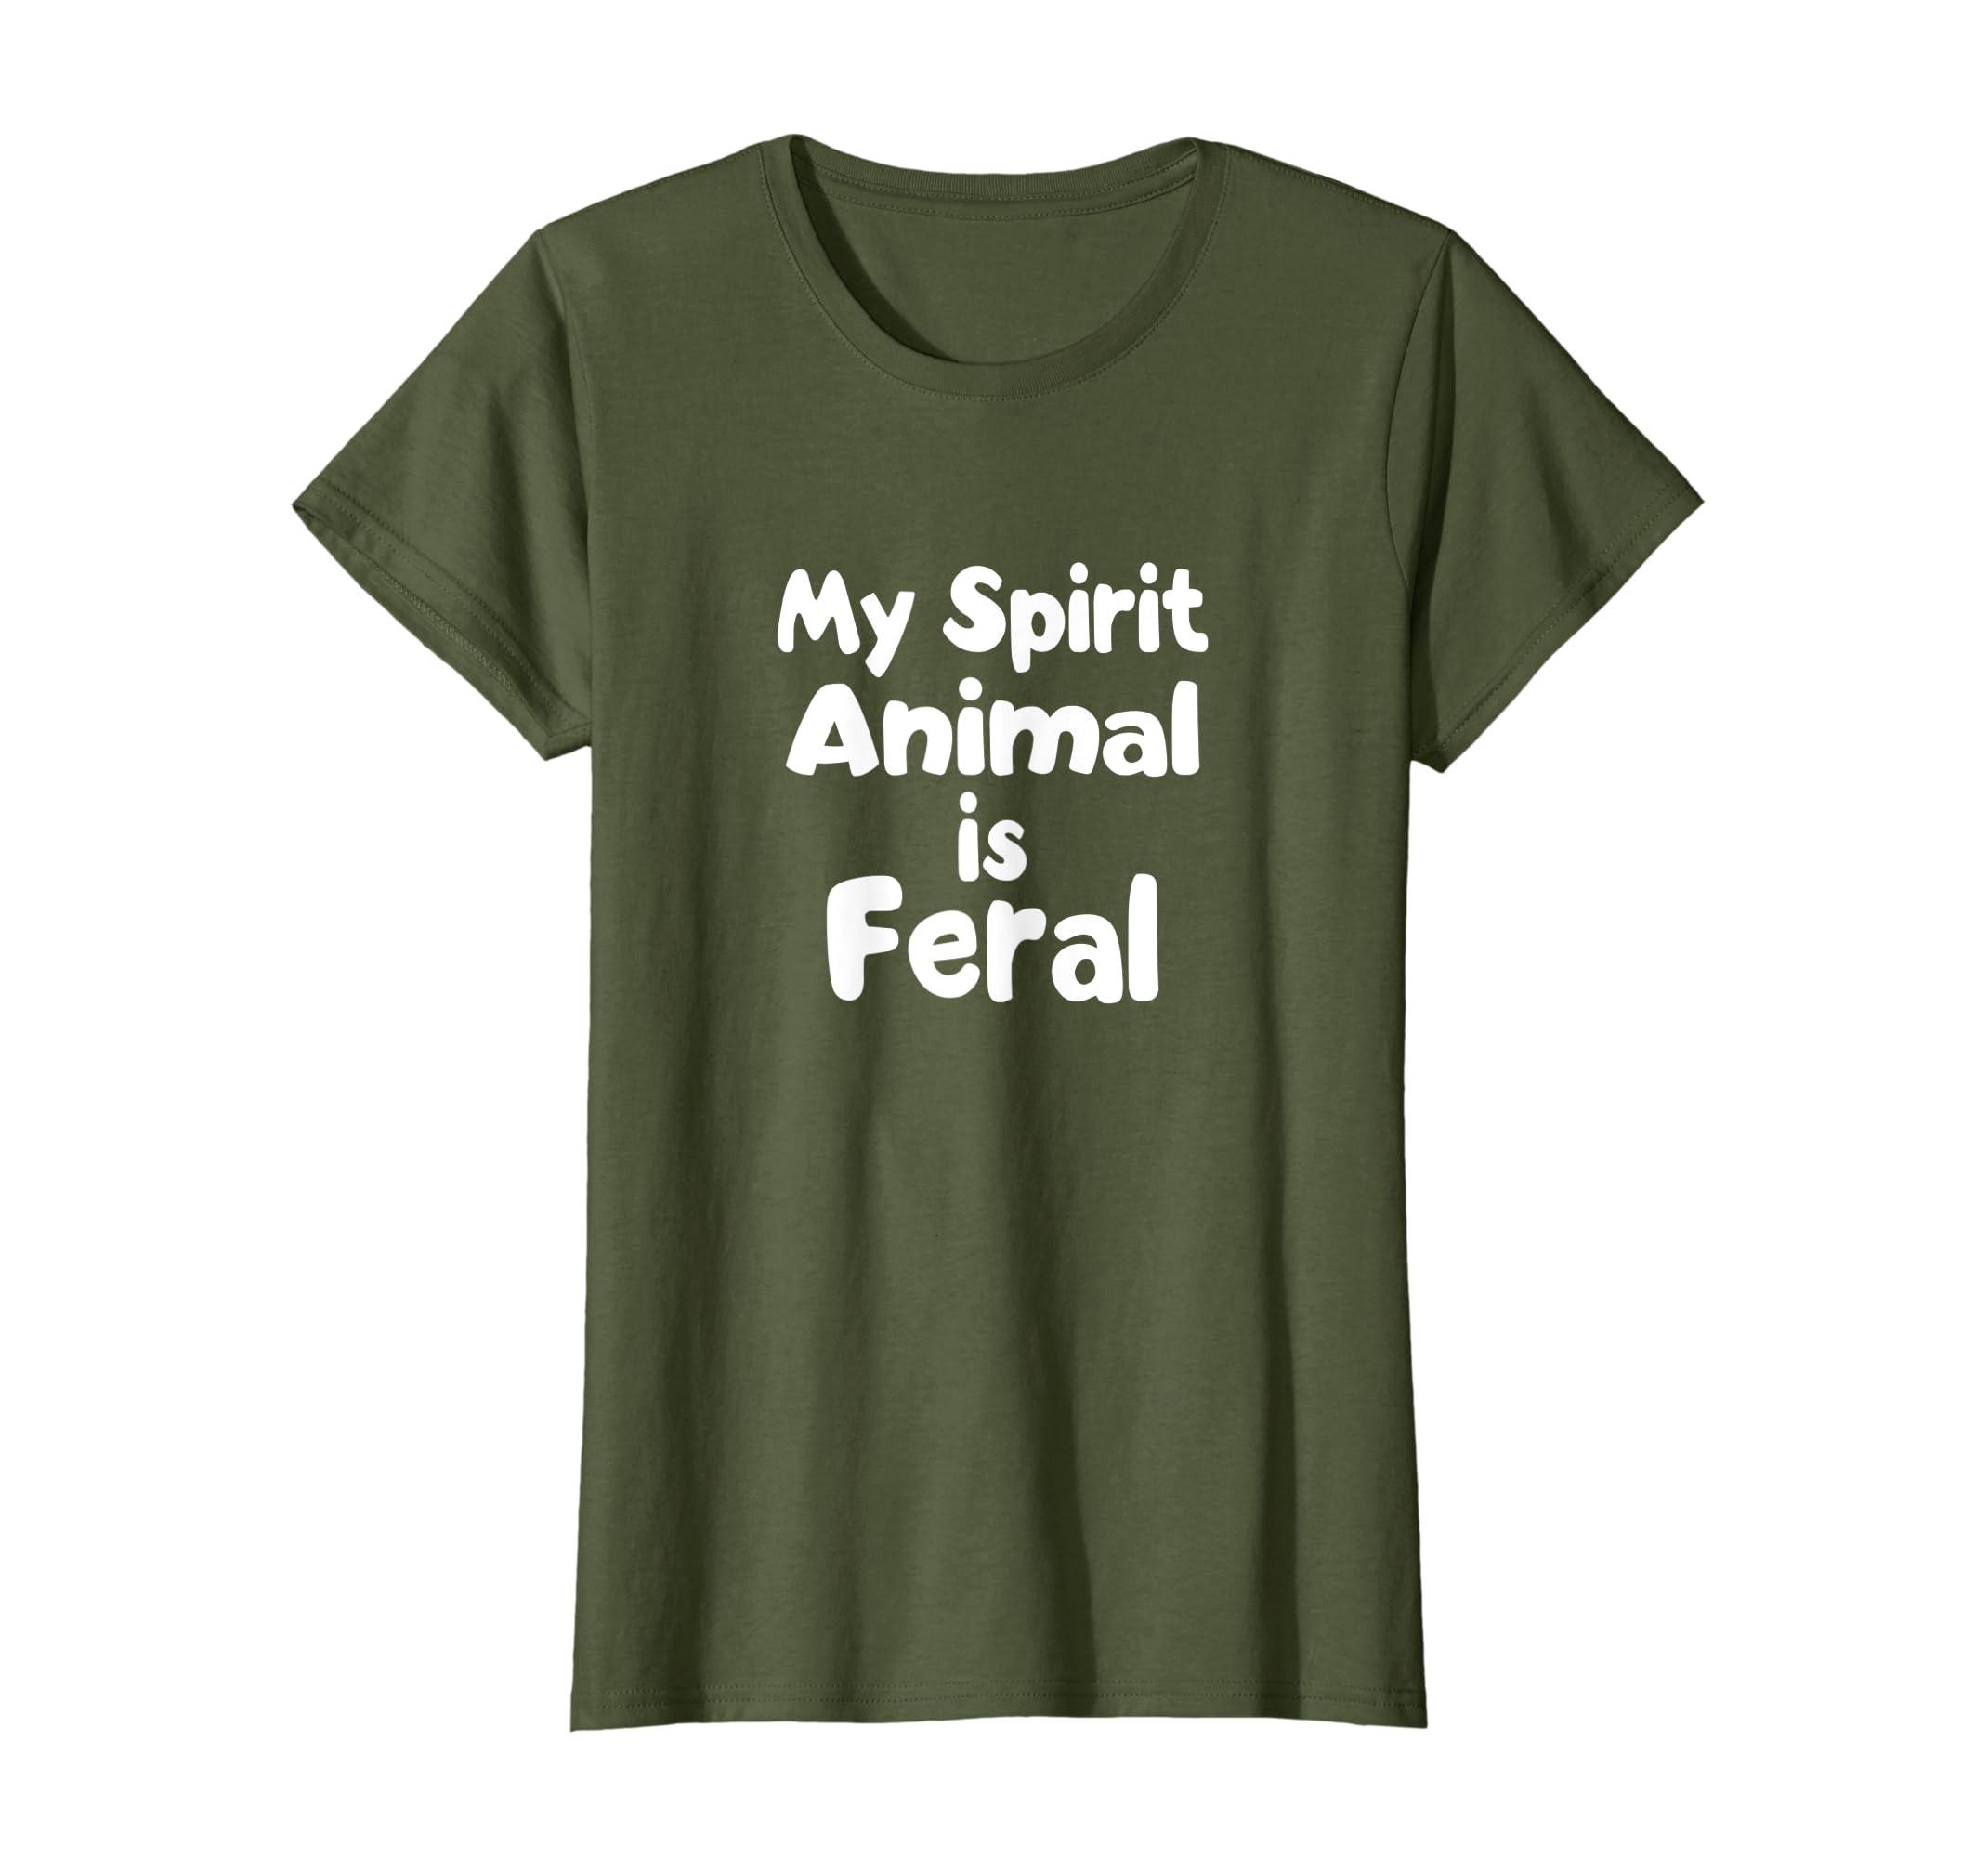 Amazon com: My spirit animal is feral: Clothing